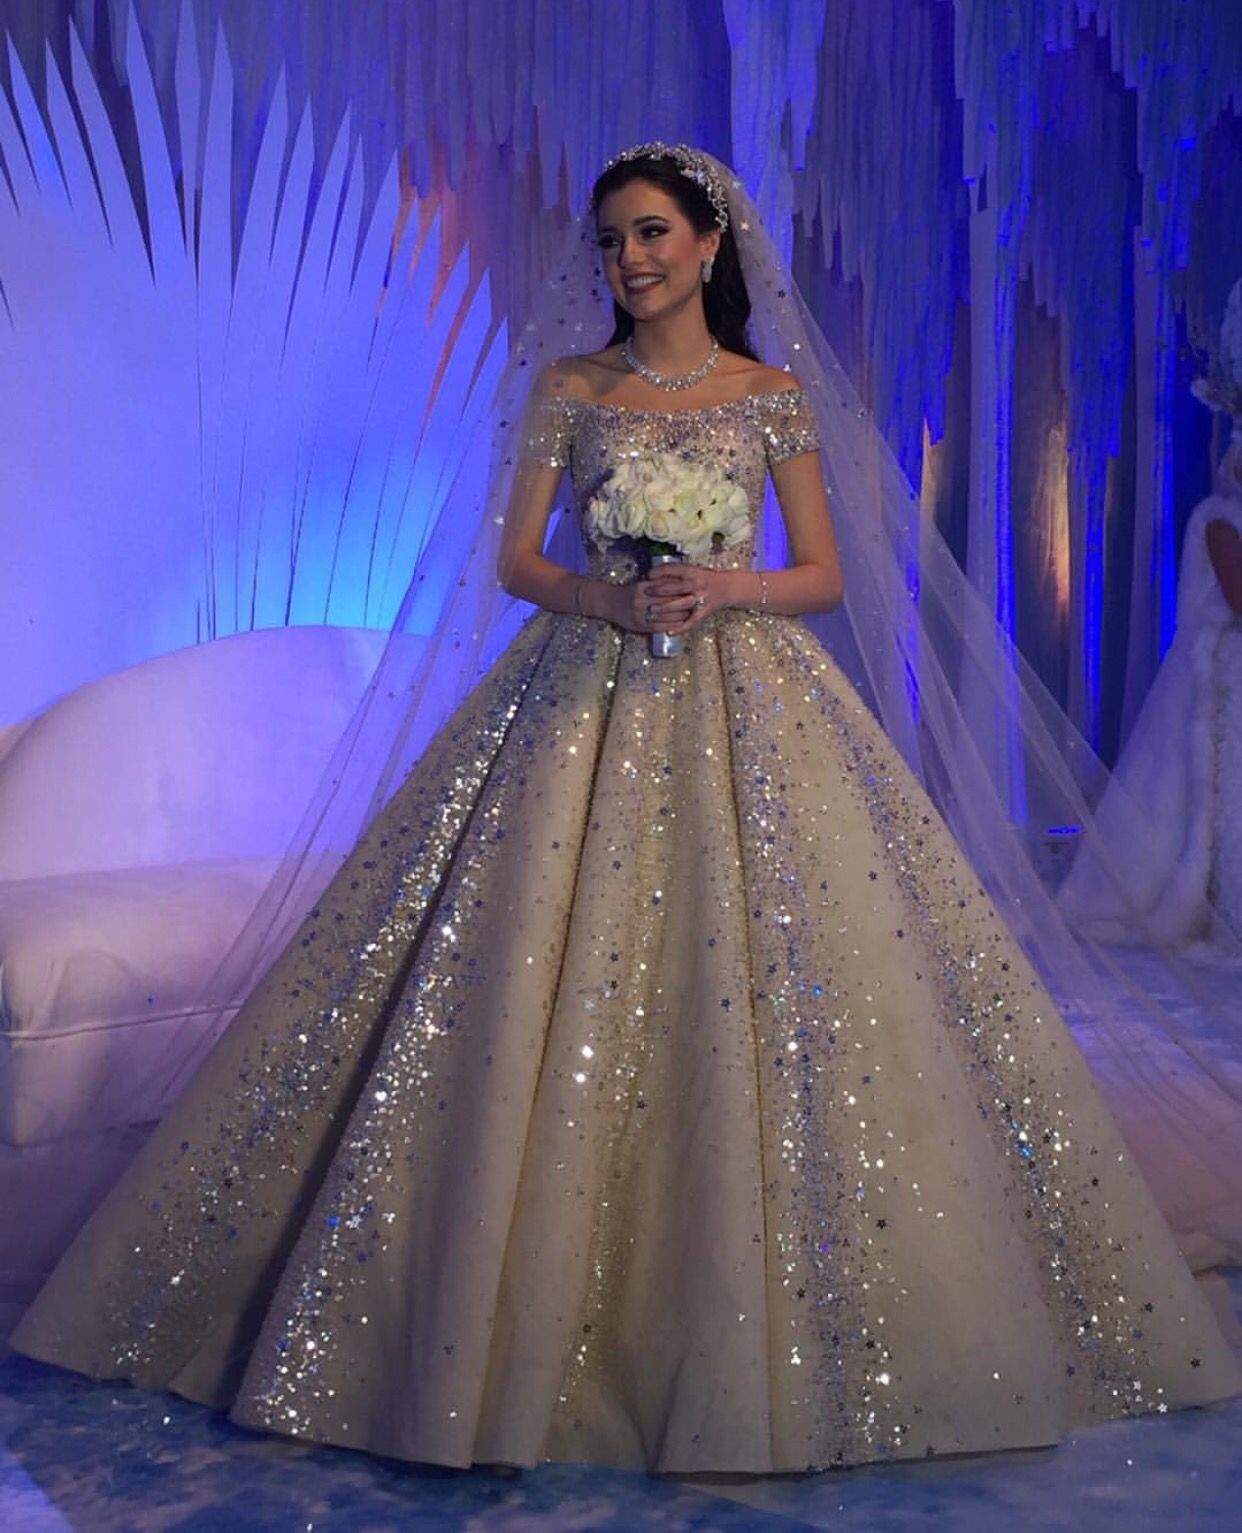 Zuhairmurad Fairytale Winterwonderland Sparkly Wedding Dress Evening Dresses For Weddings Gowns [ jpg ]